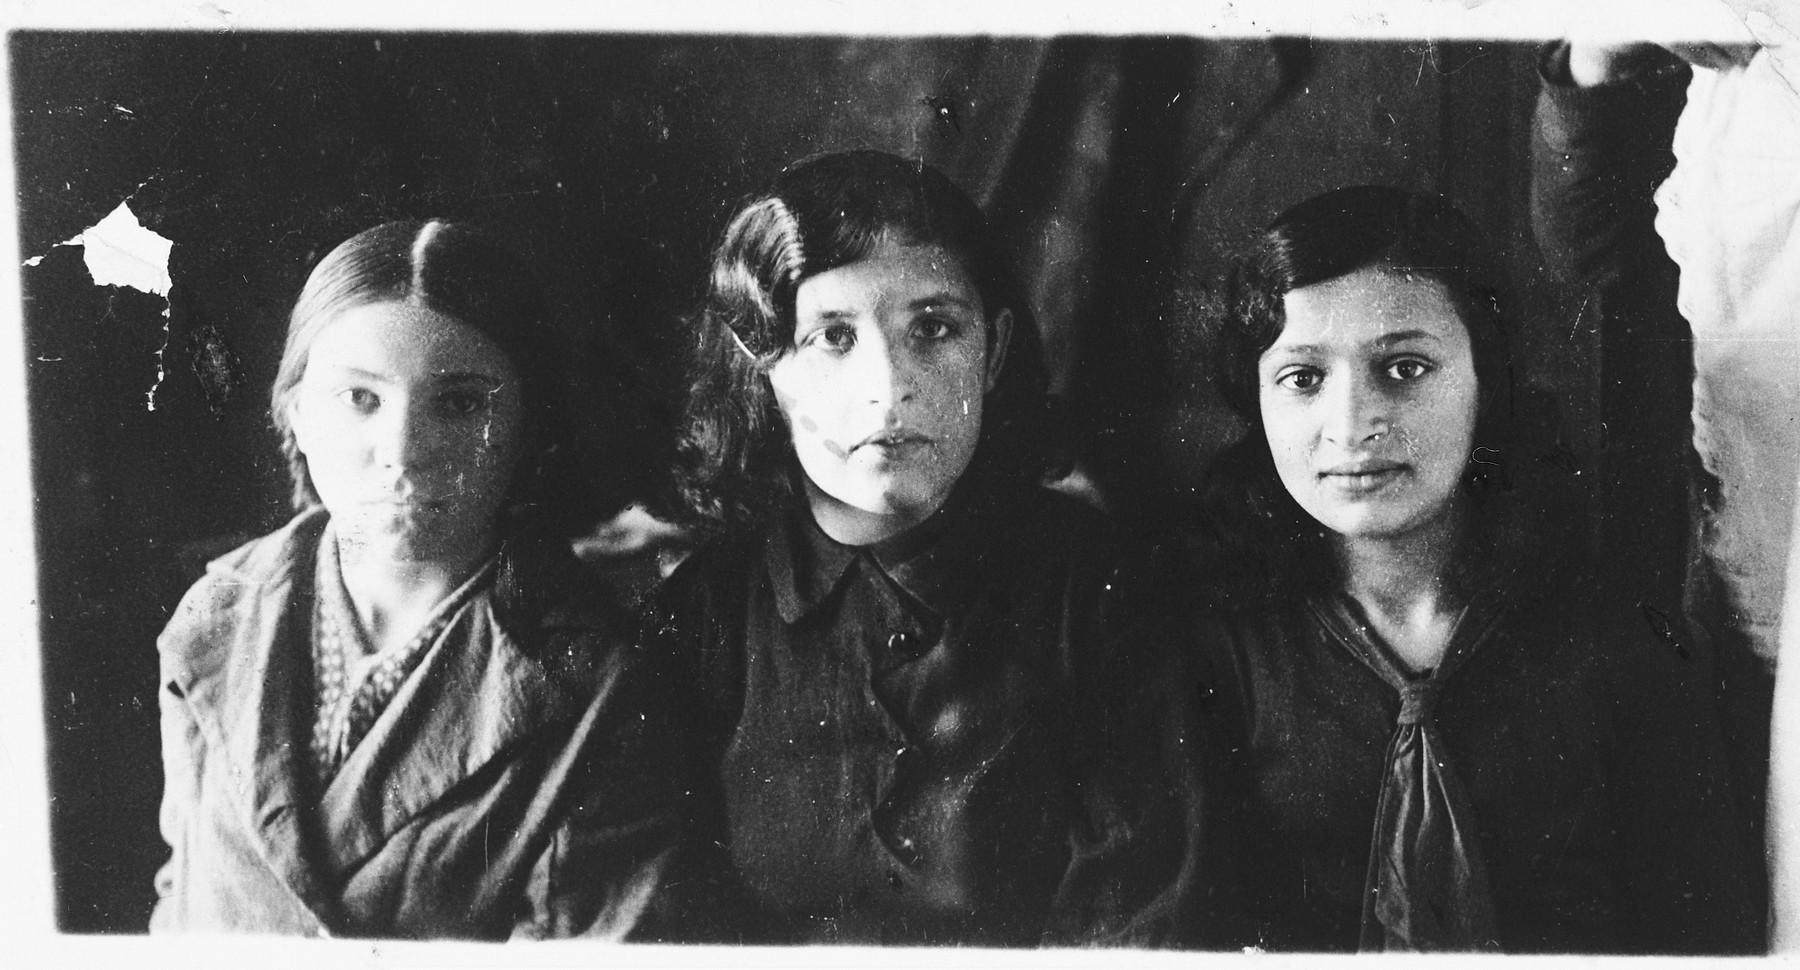 Studio portrait of three Jewish teenage girls in Chechersk, Belarus.  Pictured are Zlata, Chaya and Maria Gerchikova.